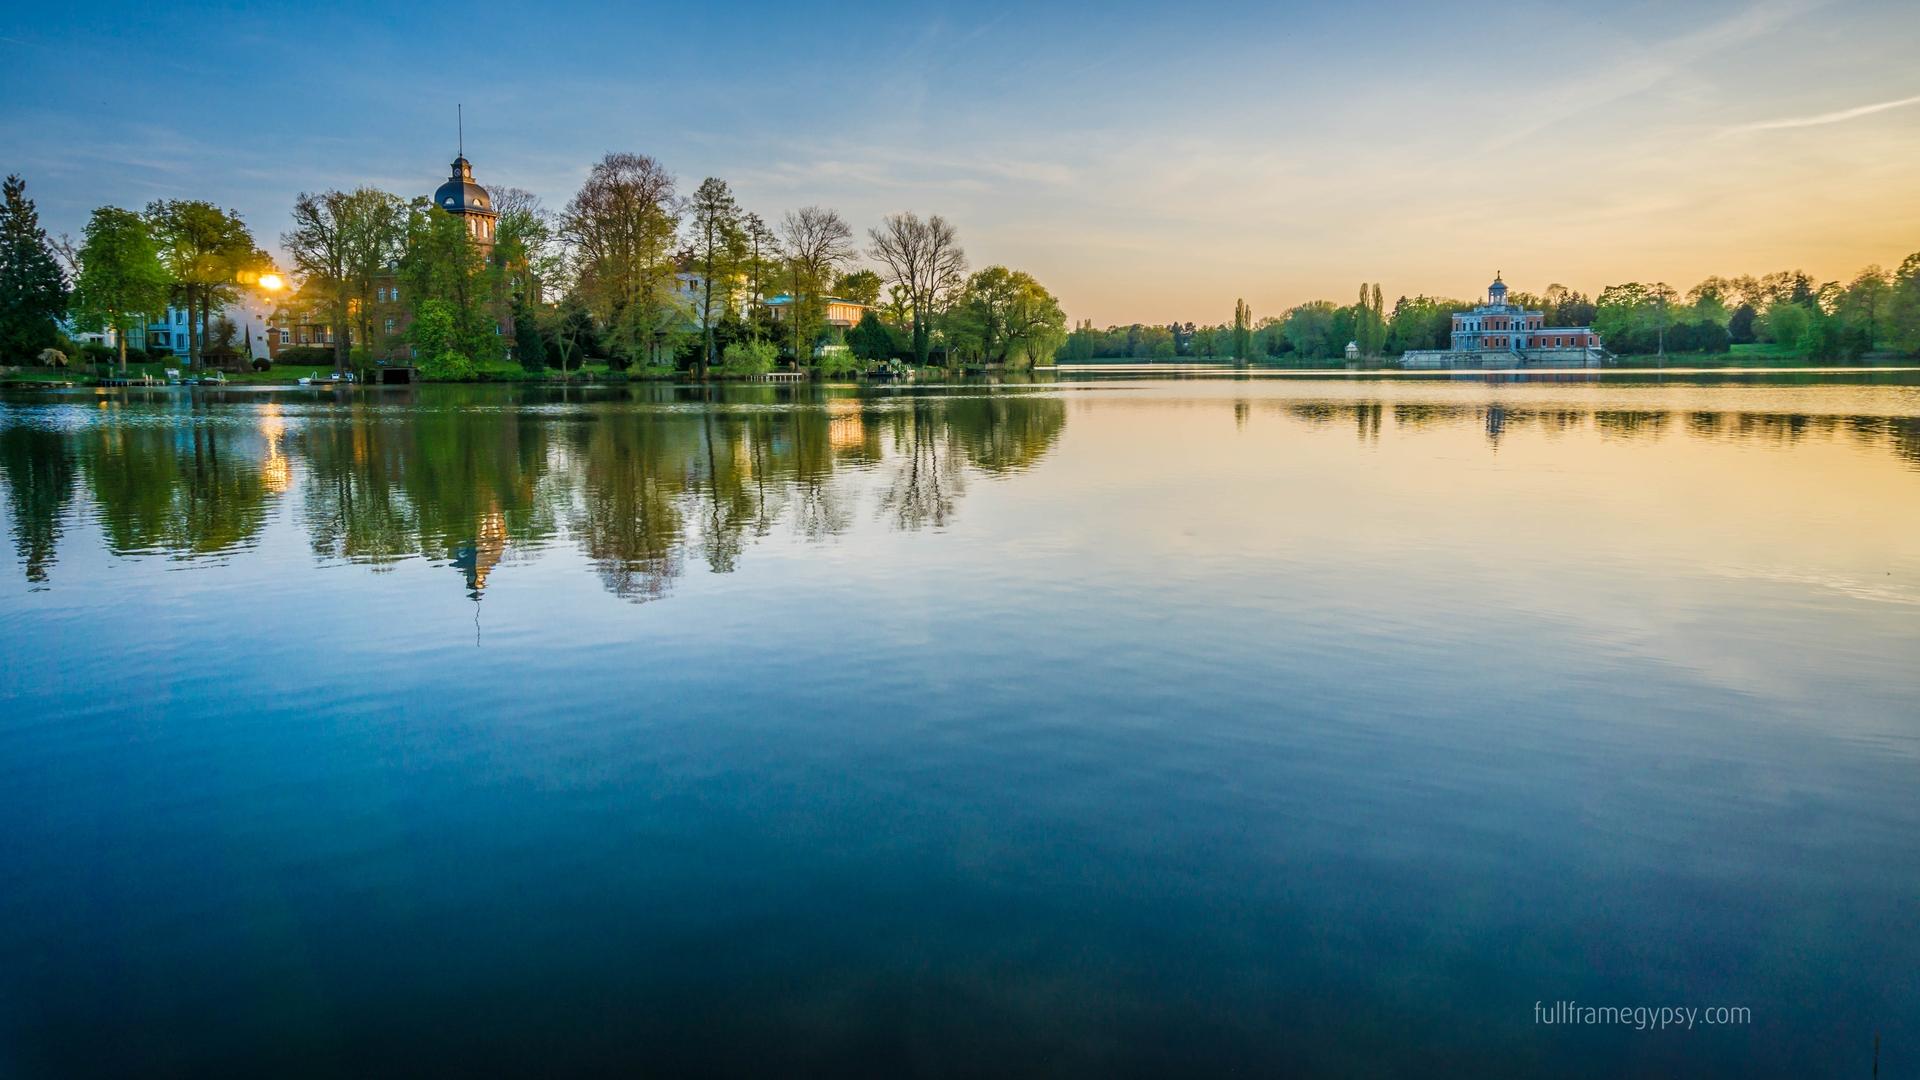 Holy Lake in Potsdam, Germany